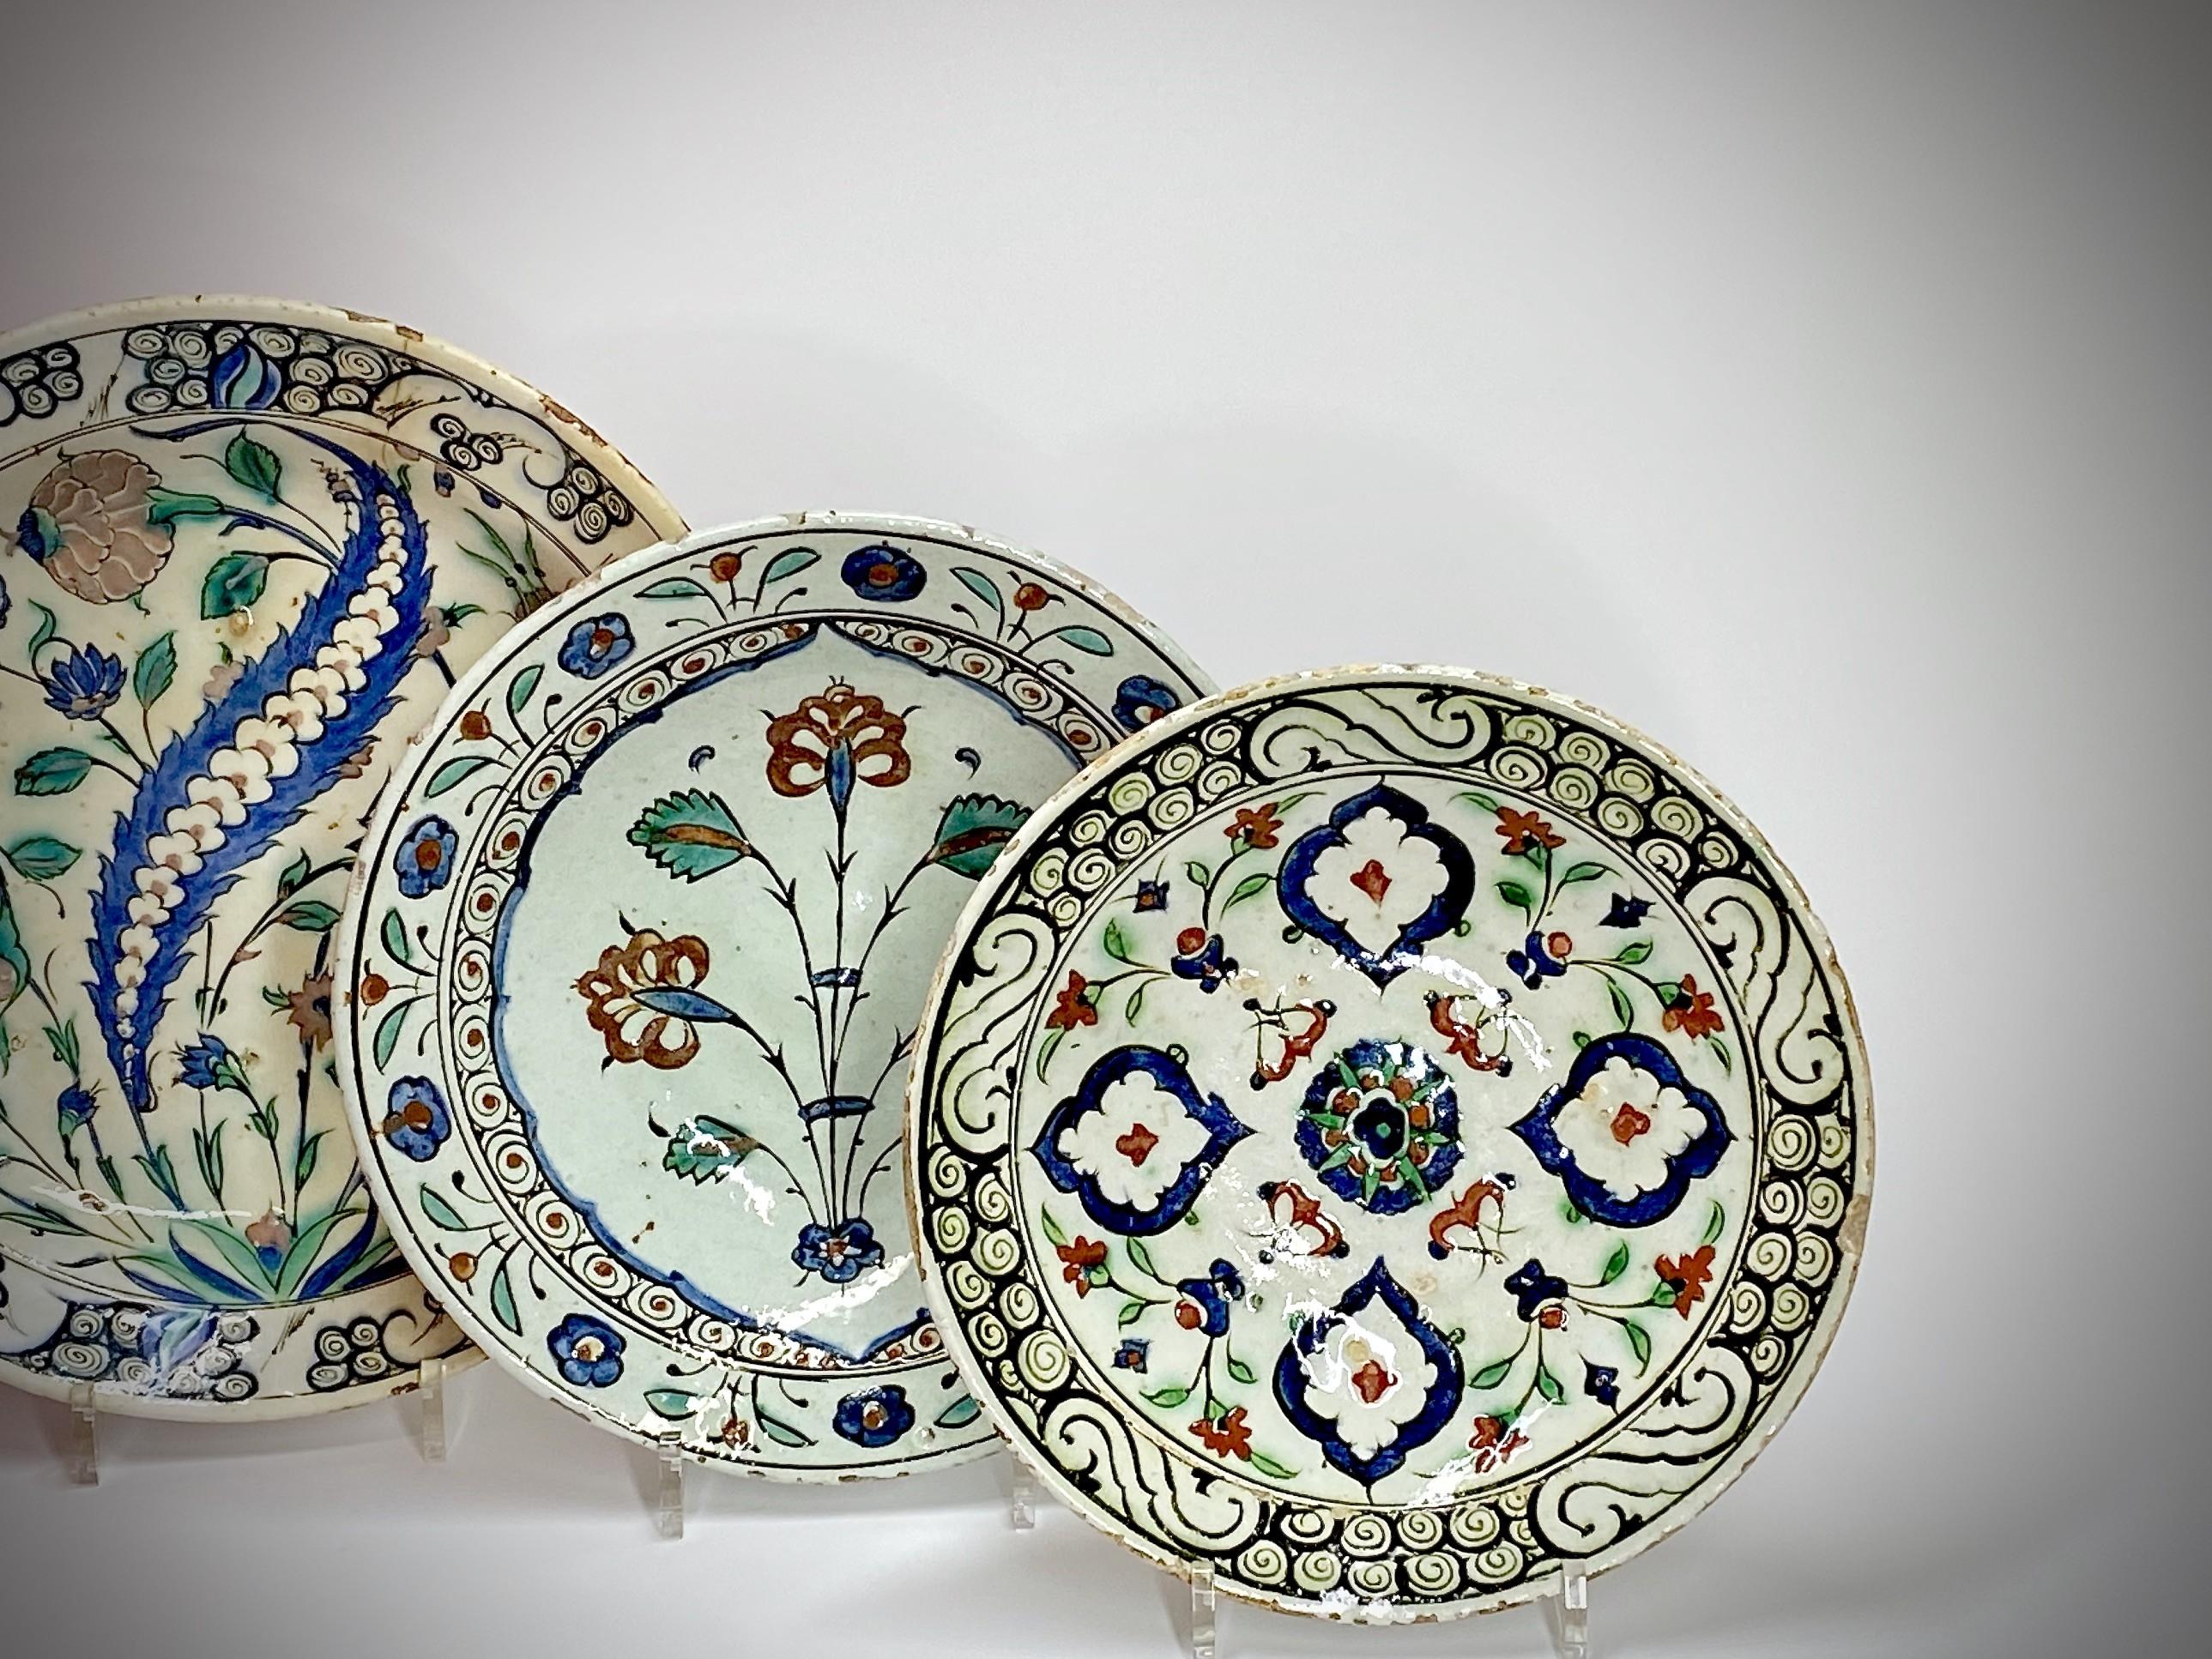 IZNIK - OTTOMAN TURKEY - SEVENTEENTH CENTURY